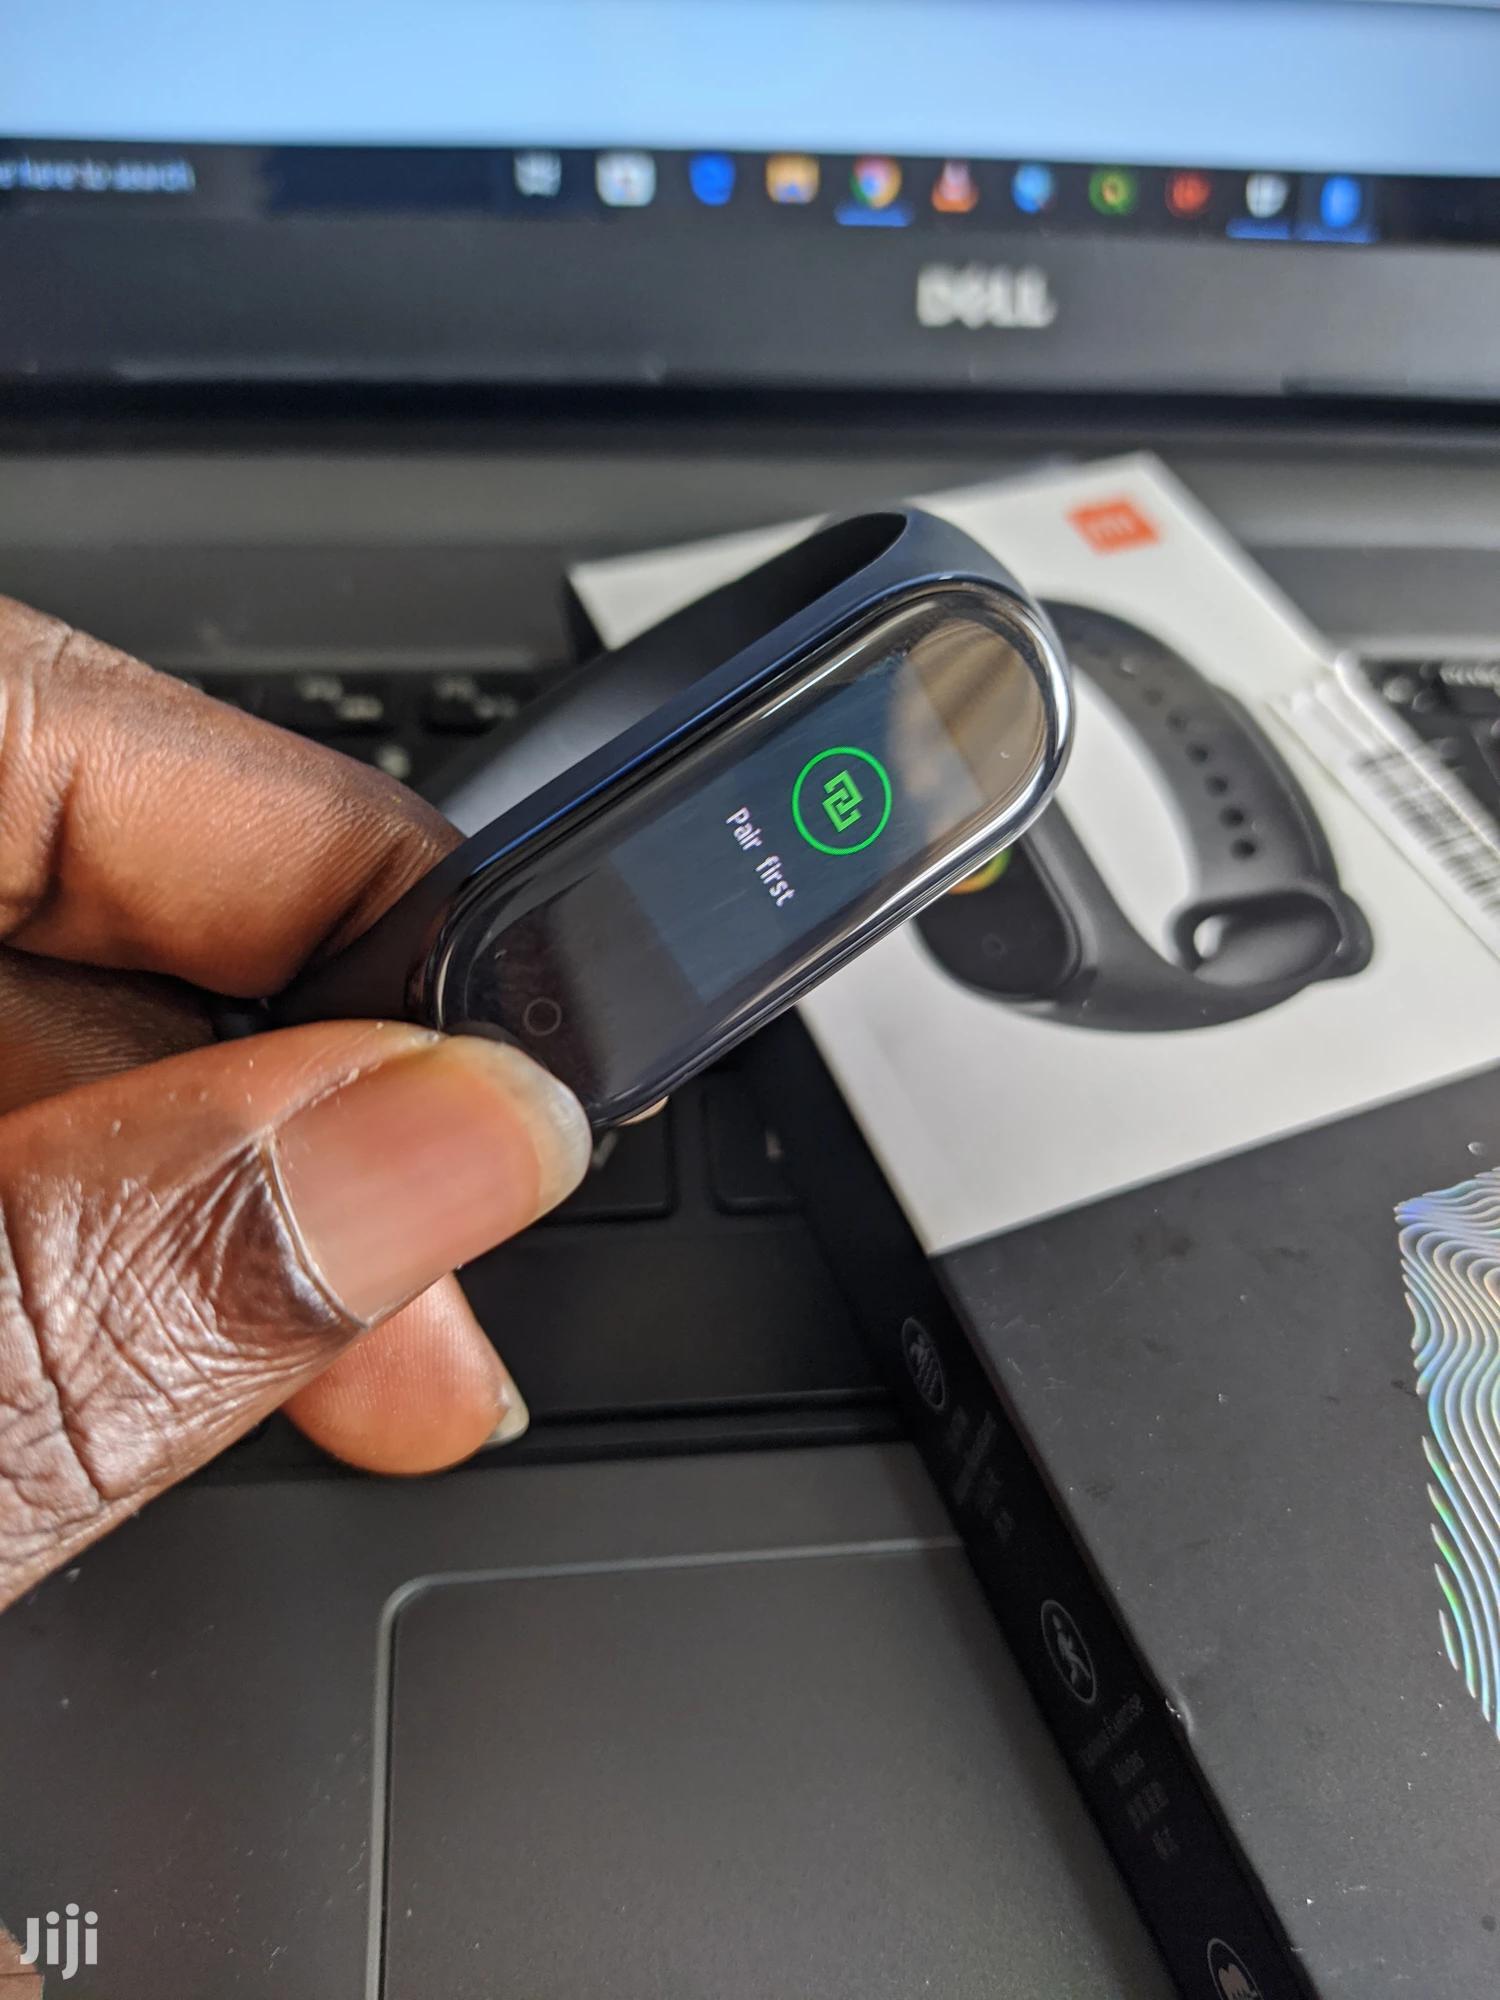 Xiaomi Mi Band 4 | Smart Watches & Trackers for sale in Kumasi Metropolitan, Ashanti, Ghana